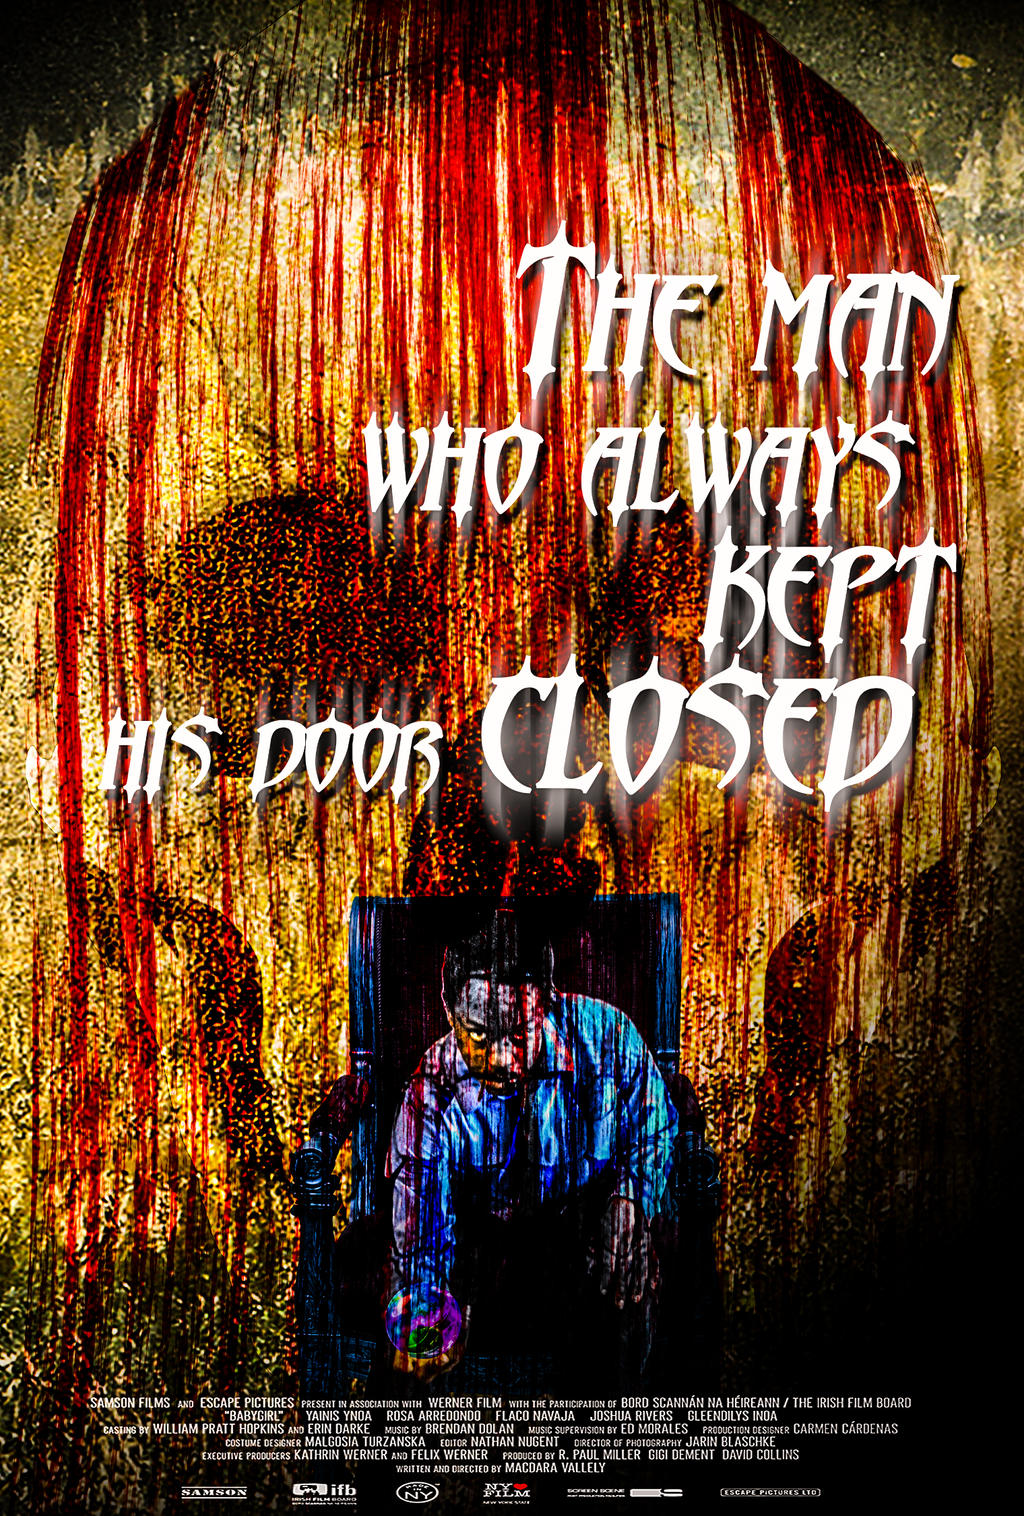 The man who always kepy has door closed (2)